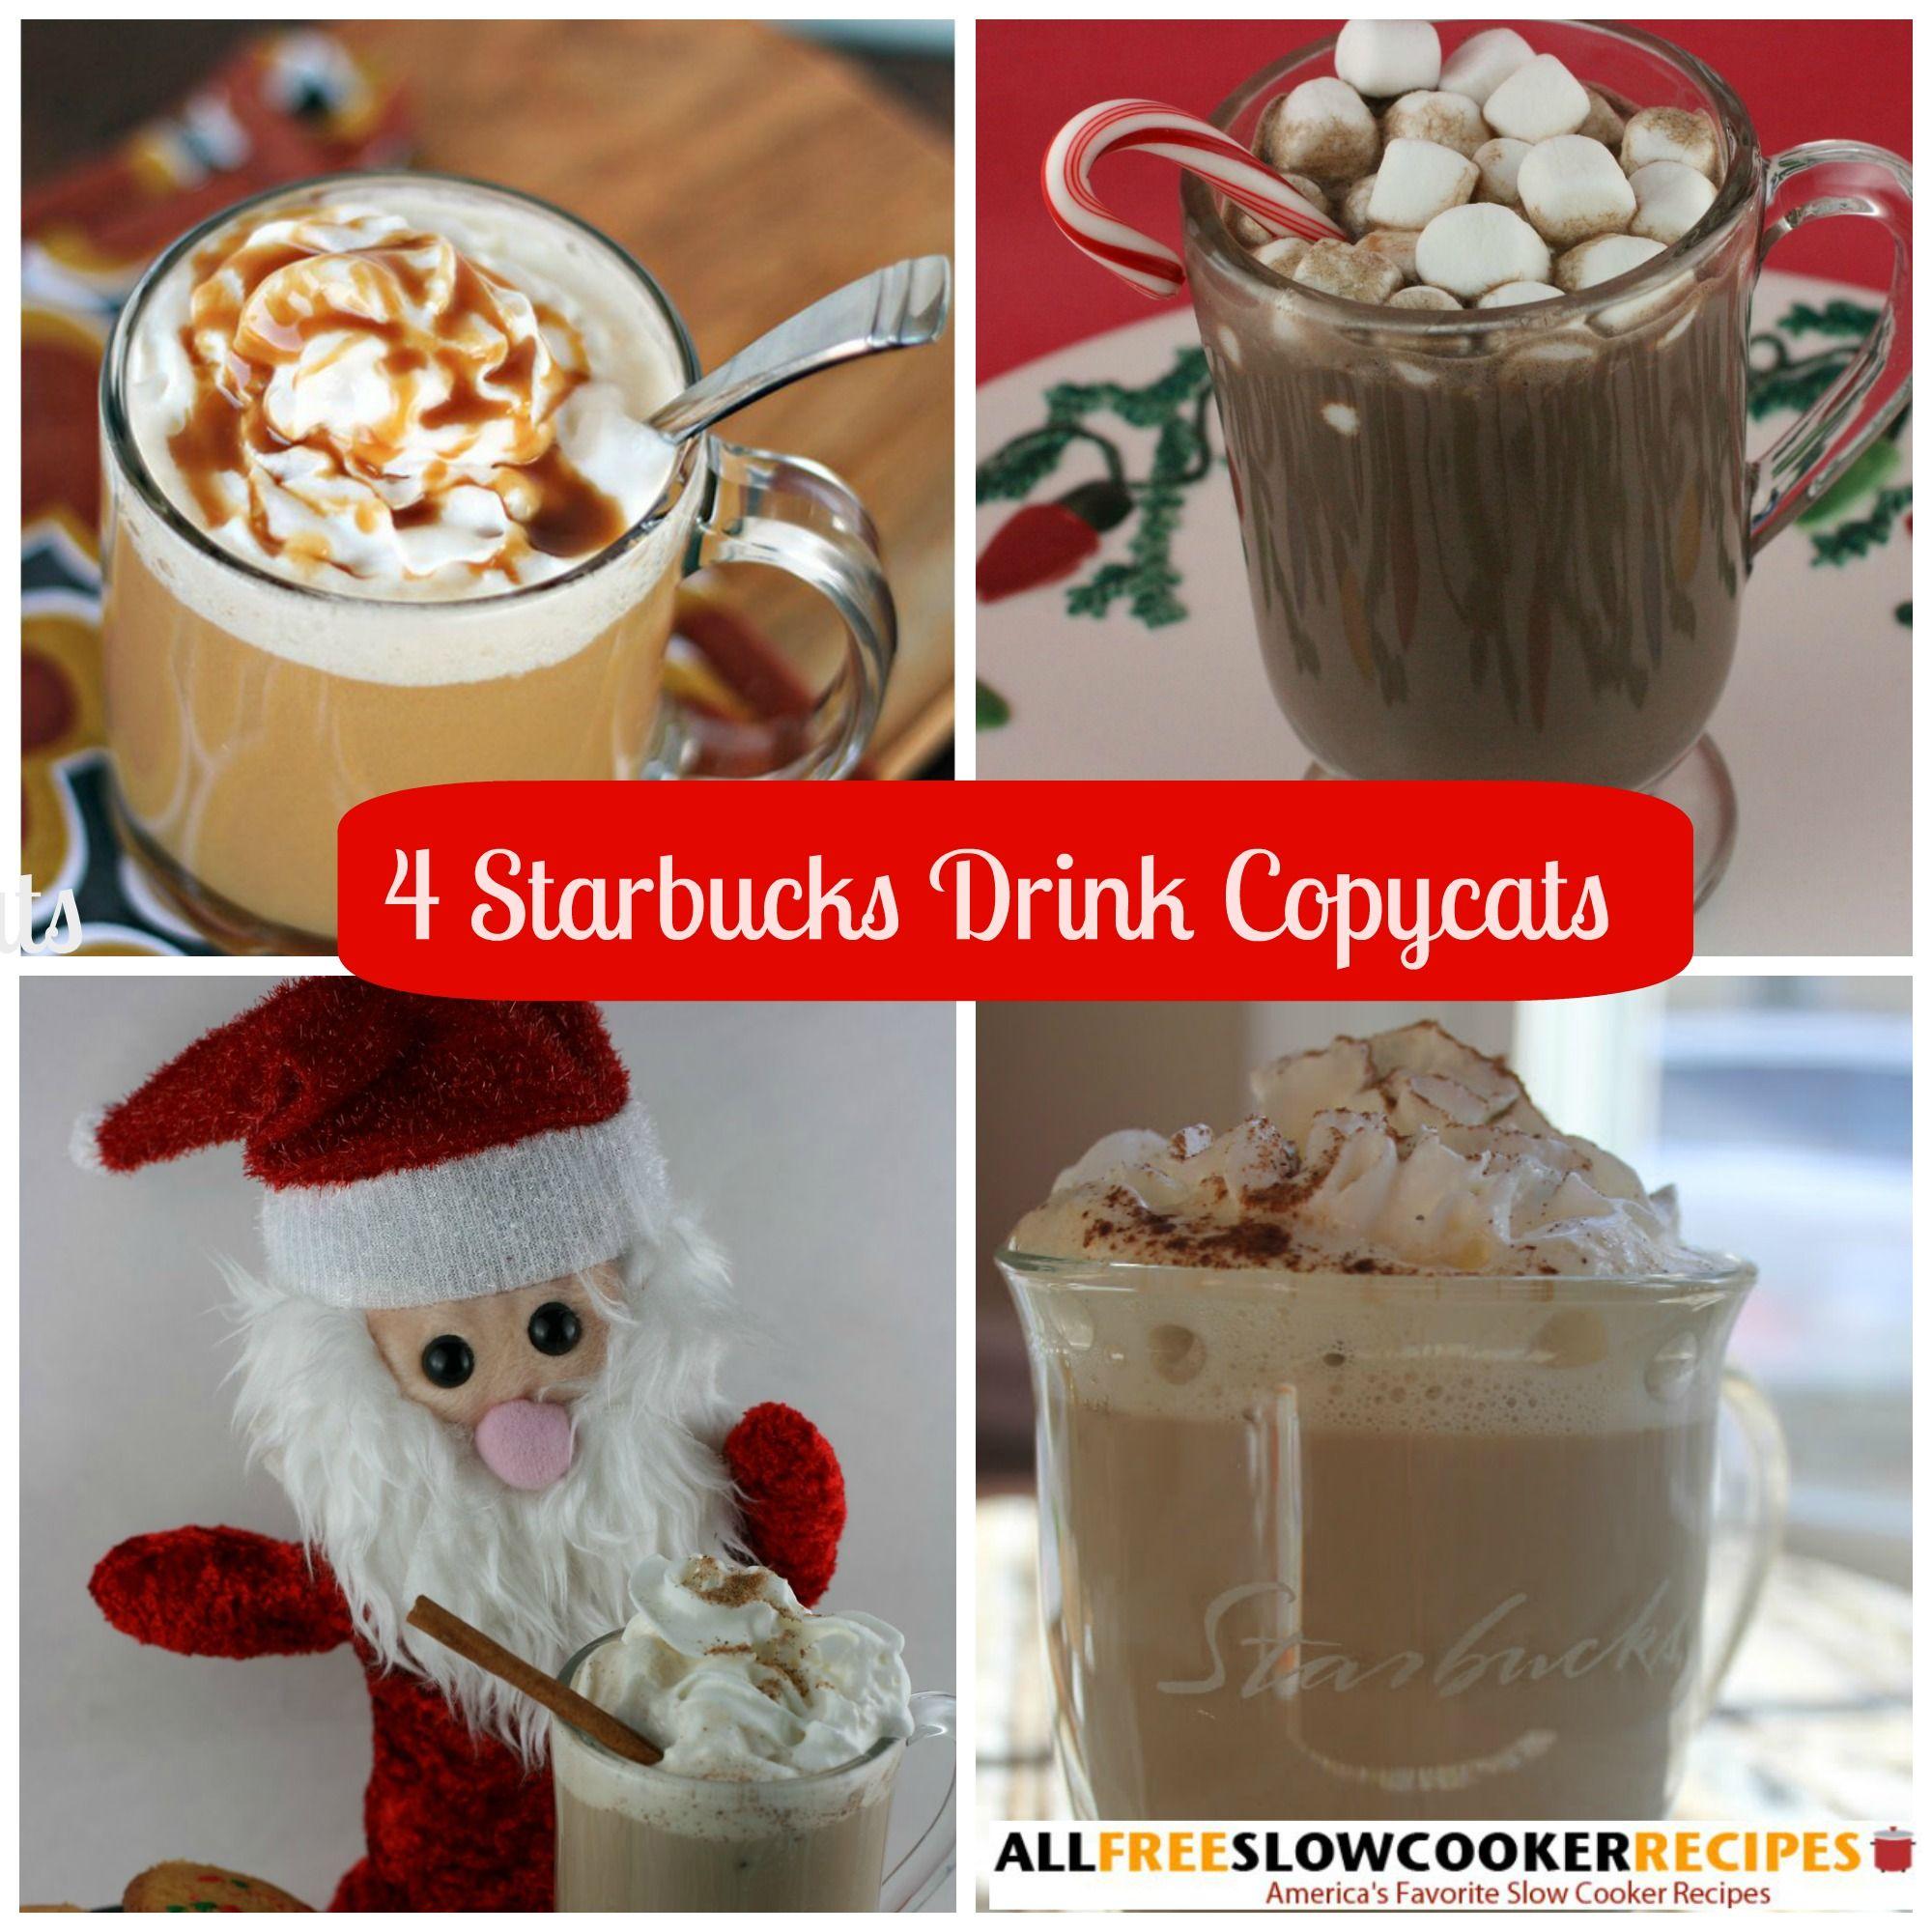 DIY Starbucks: 4 Copycat Starbucks Drinks Recipes For Slow